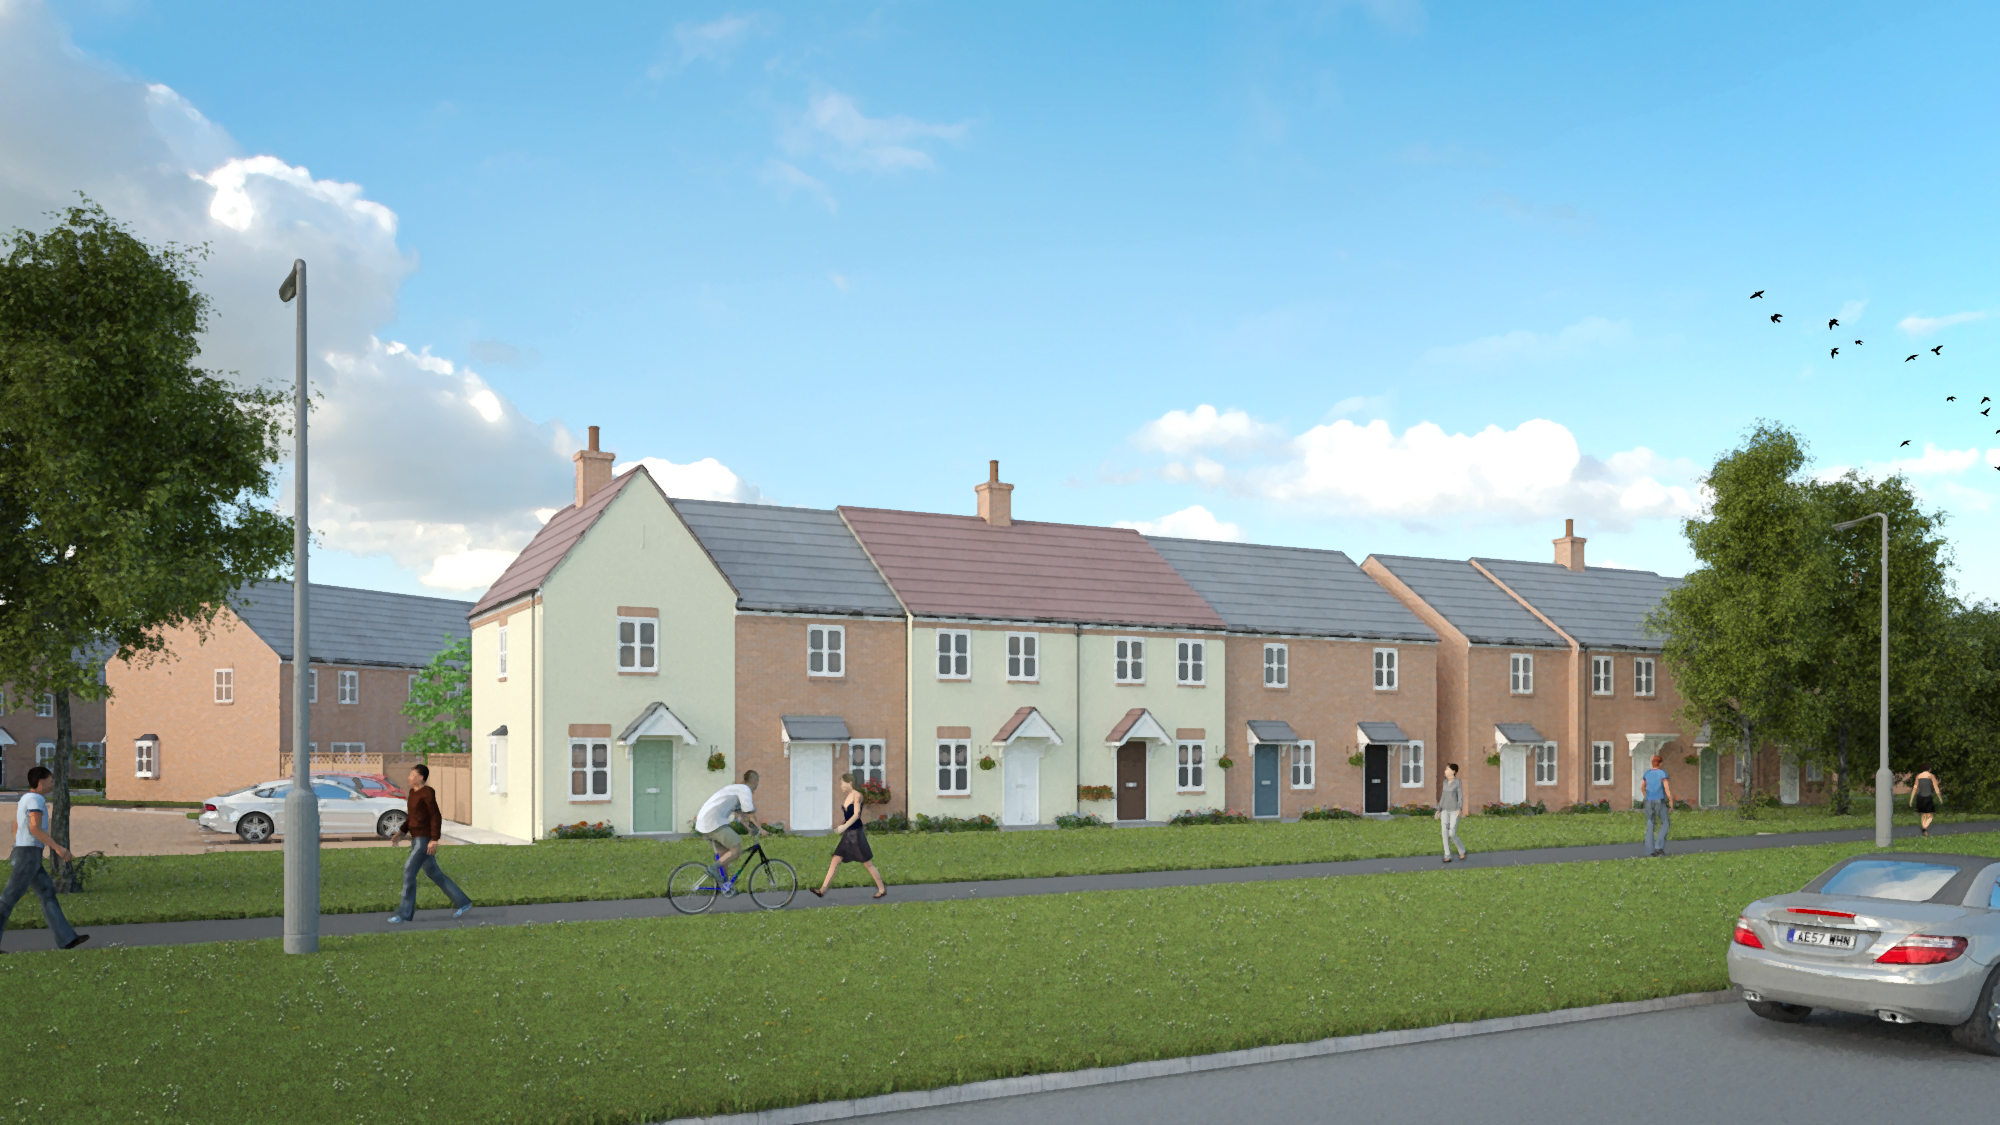 Orbit homes union park deeley for Modern homes leamington